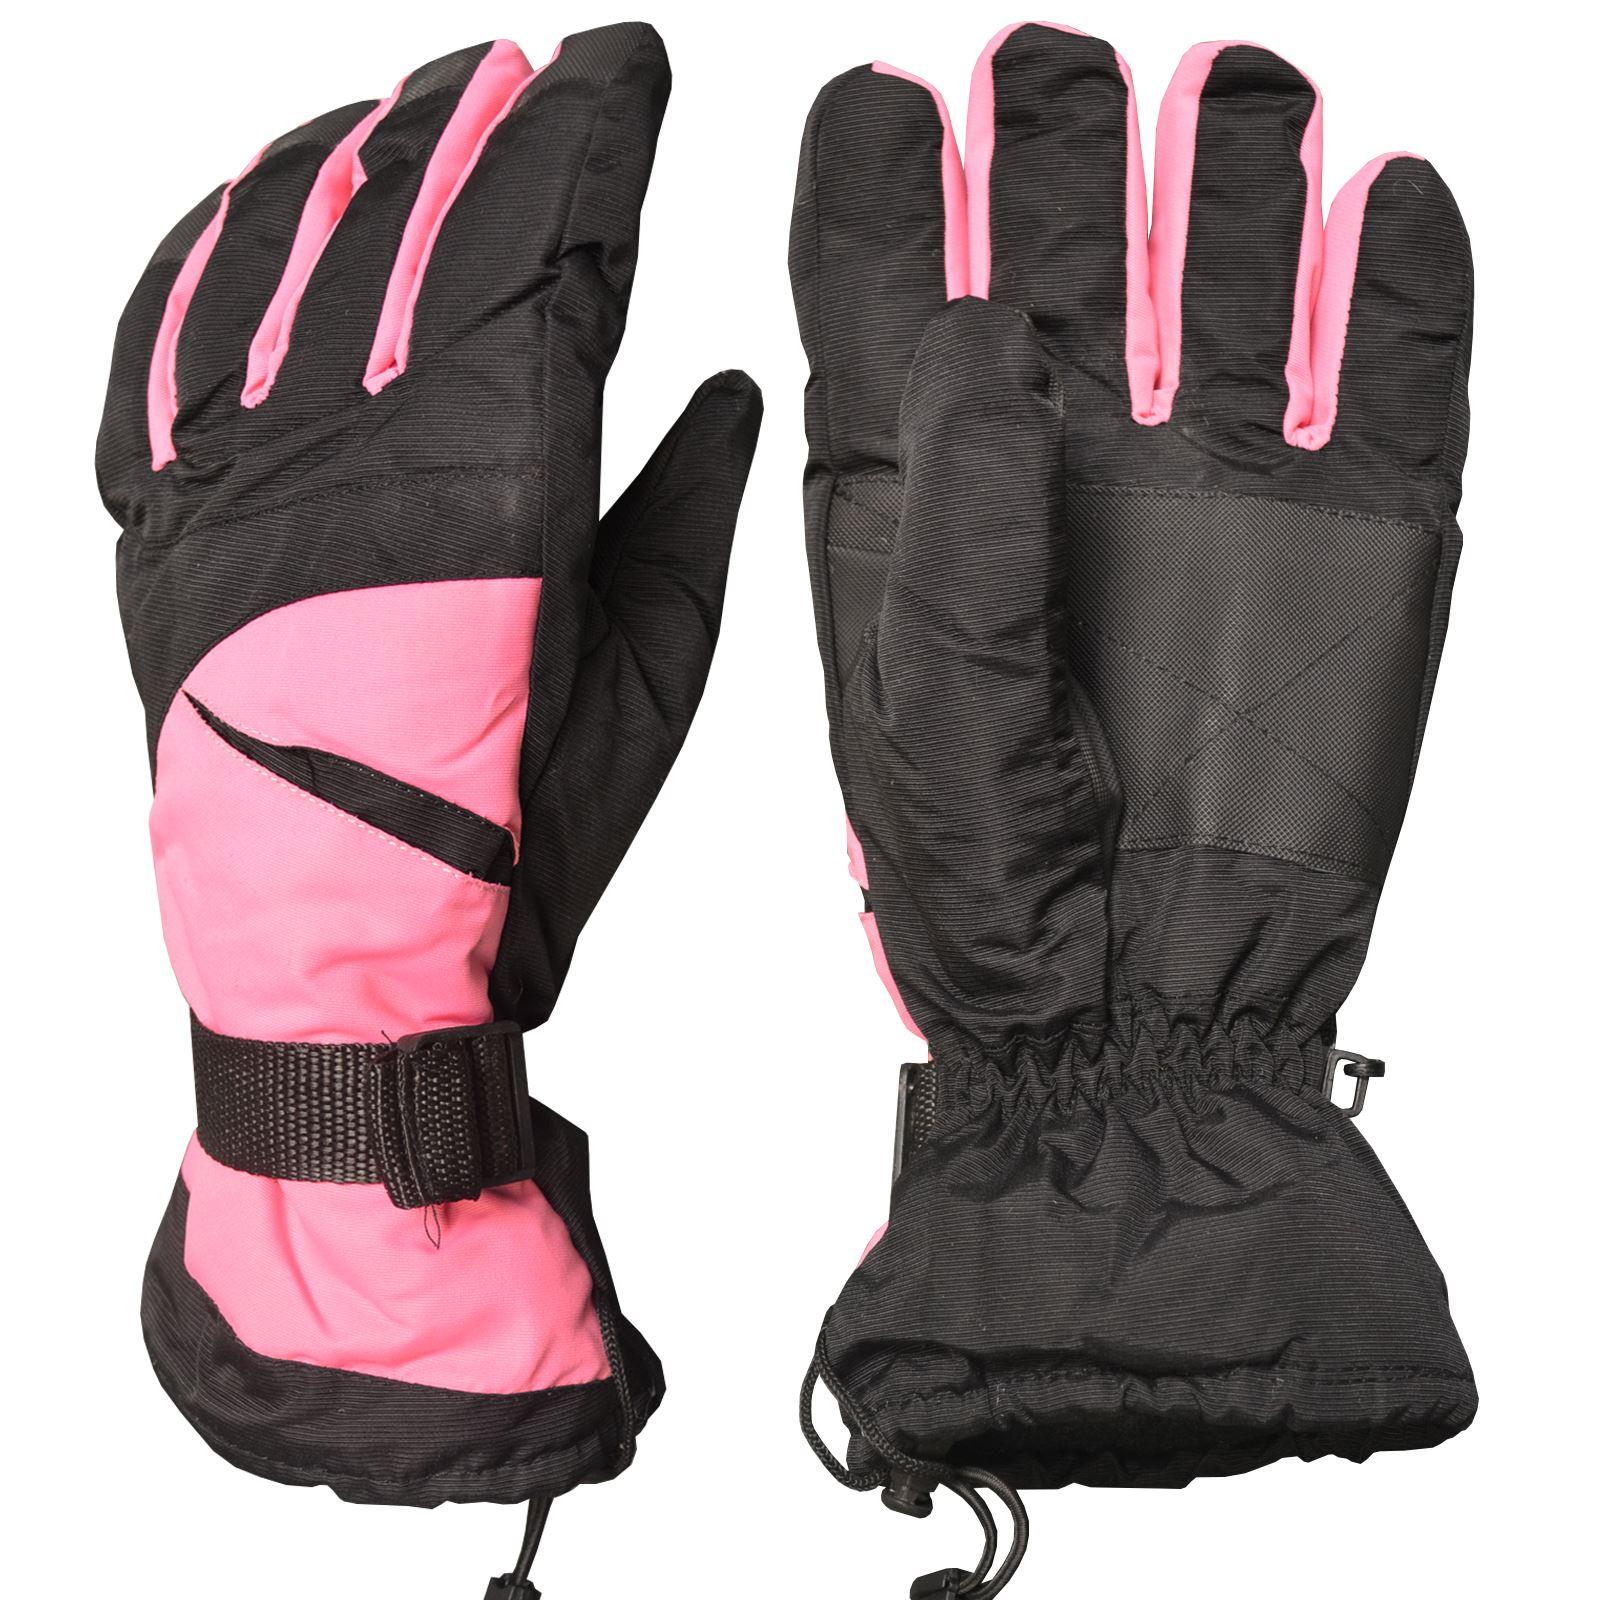 Sport Snow Gloves: UNISEX MEN WOMEN THERMAL WINTER SNOW SPORT SKI RACING